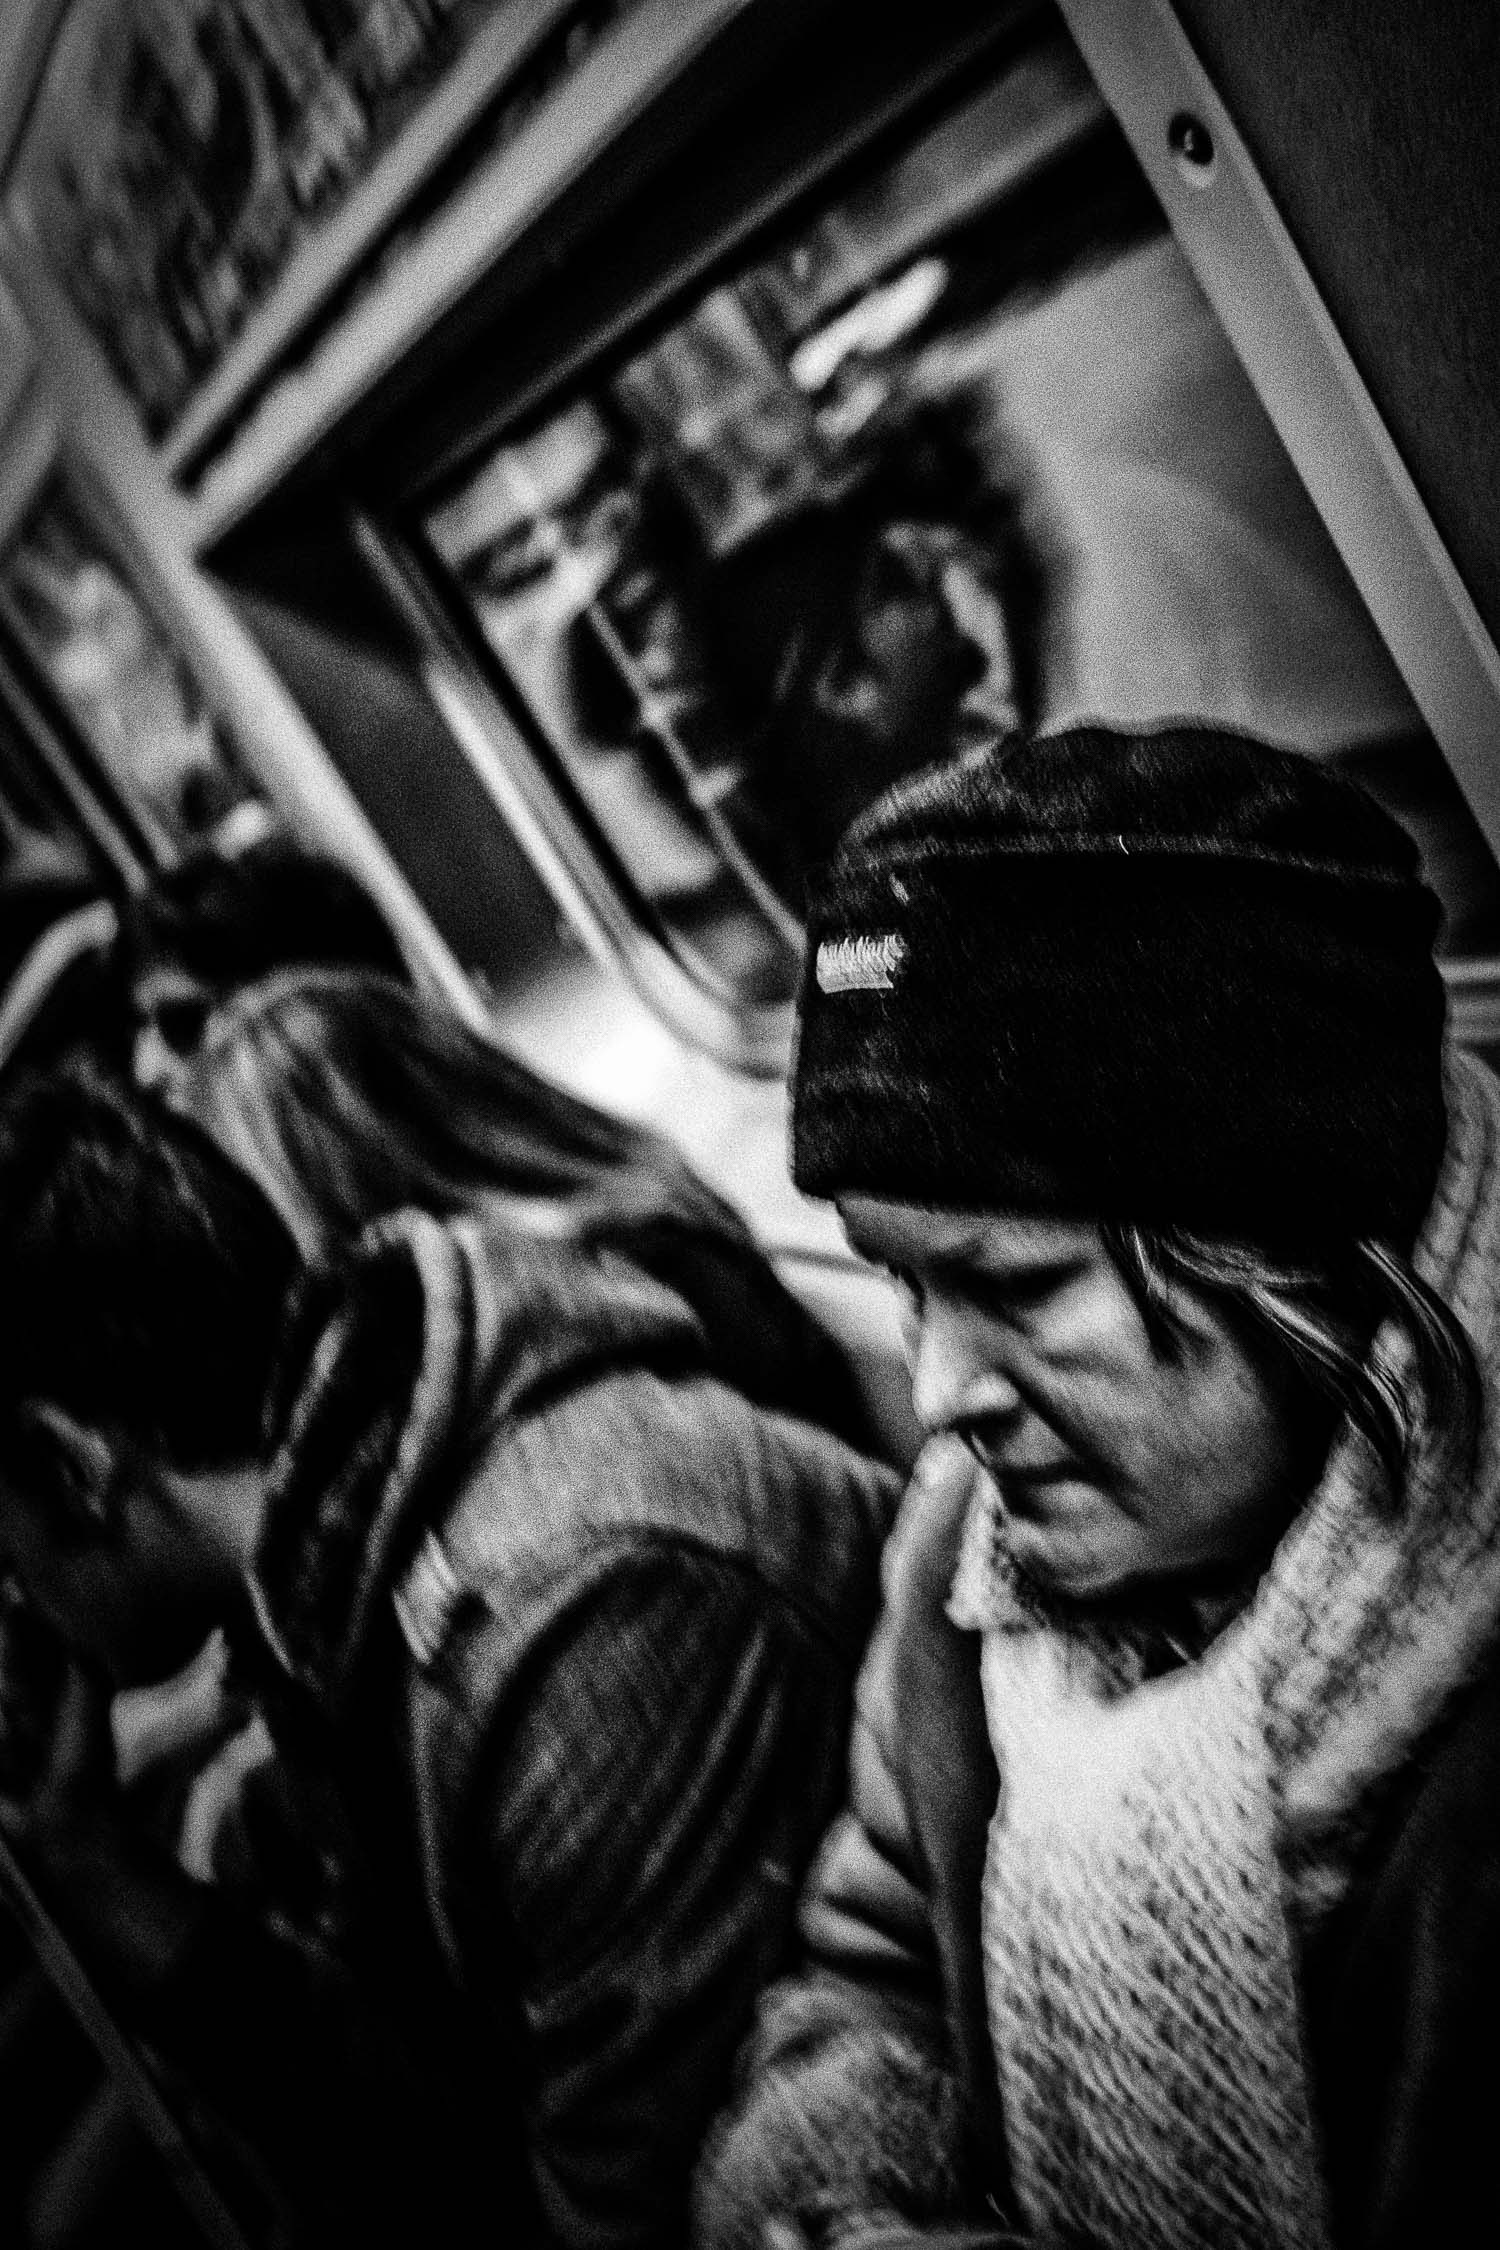 subway_10x15_16.jpg